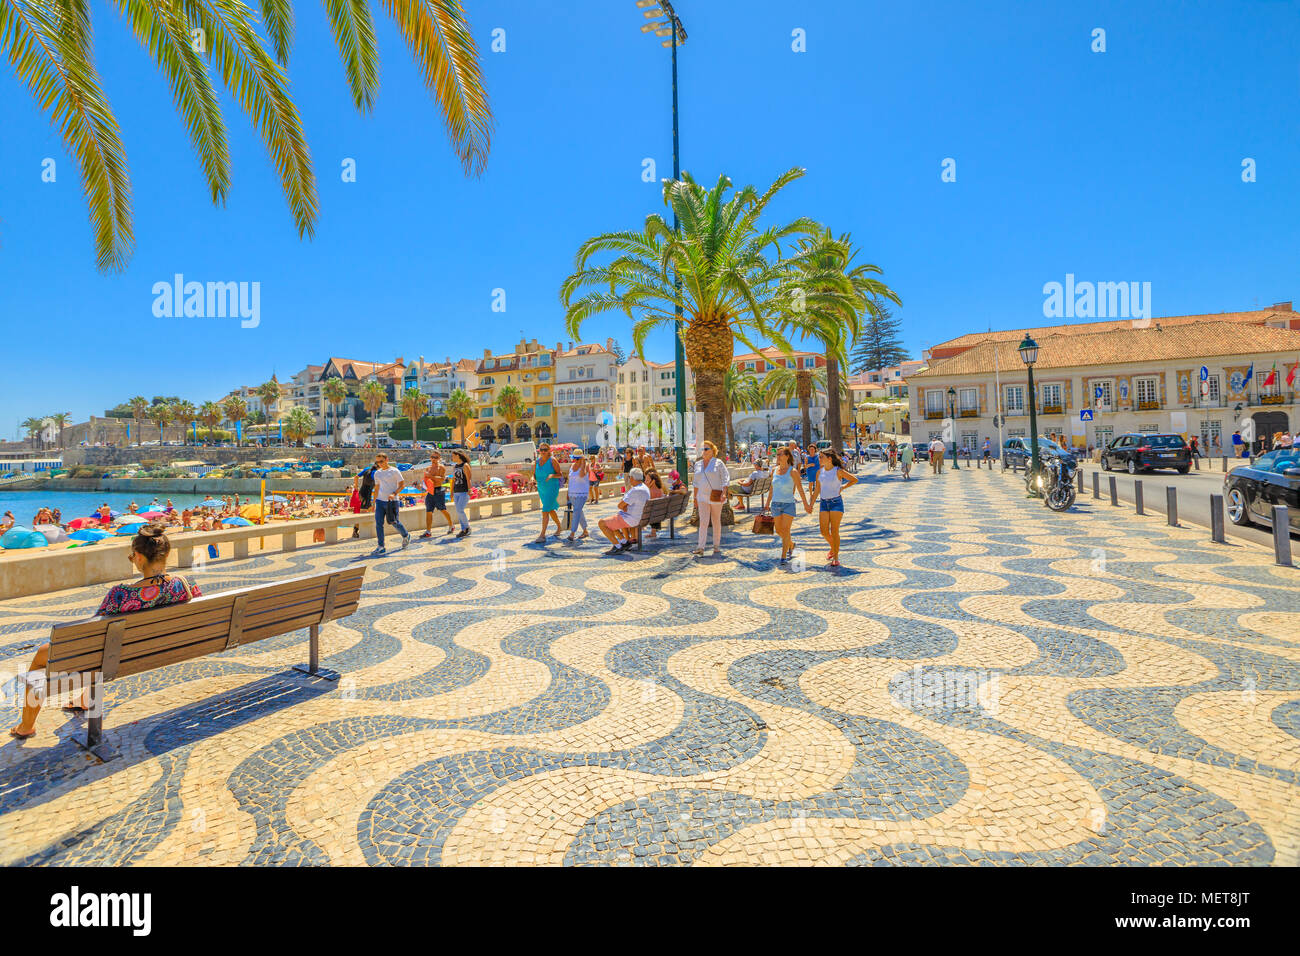 Cascais, Portugal - August 6, 2017: promenade along Ribeira beach on Passeio Dom Luis I street. Cascais is popular summer vacation spot in Lisbon Coast, Portugal. People enjoying summer holidays. - Stock Image